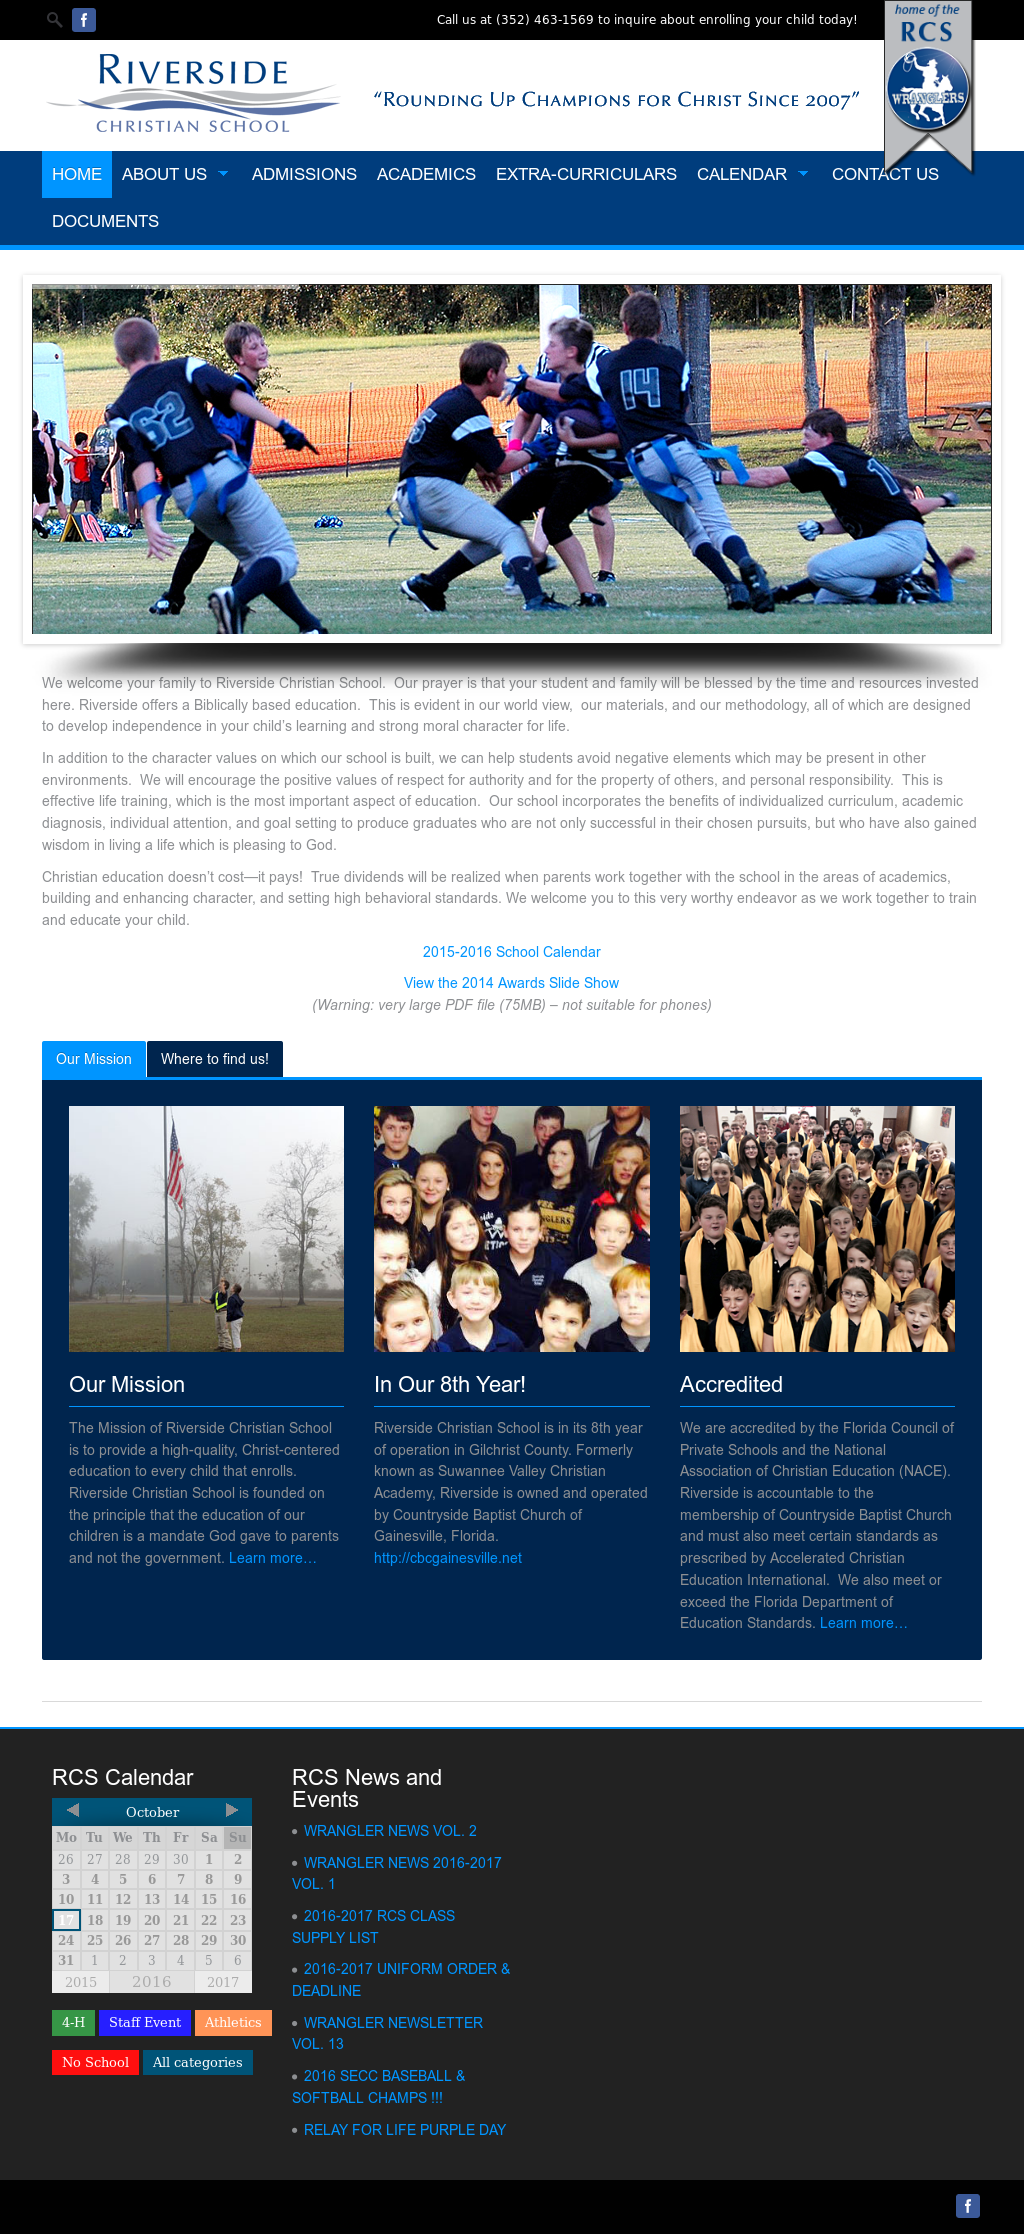 Rvrsidechristian Competitors, Revenue and Employees - Owler Company